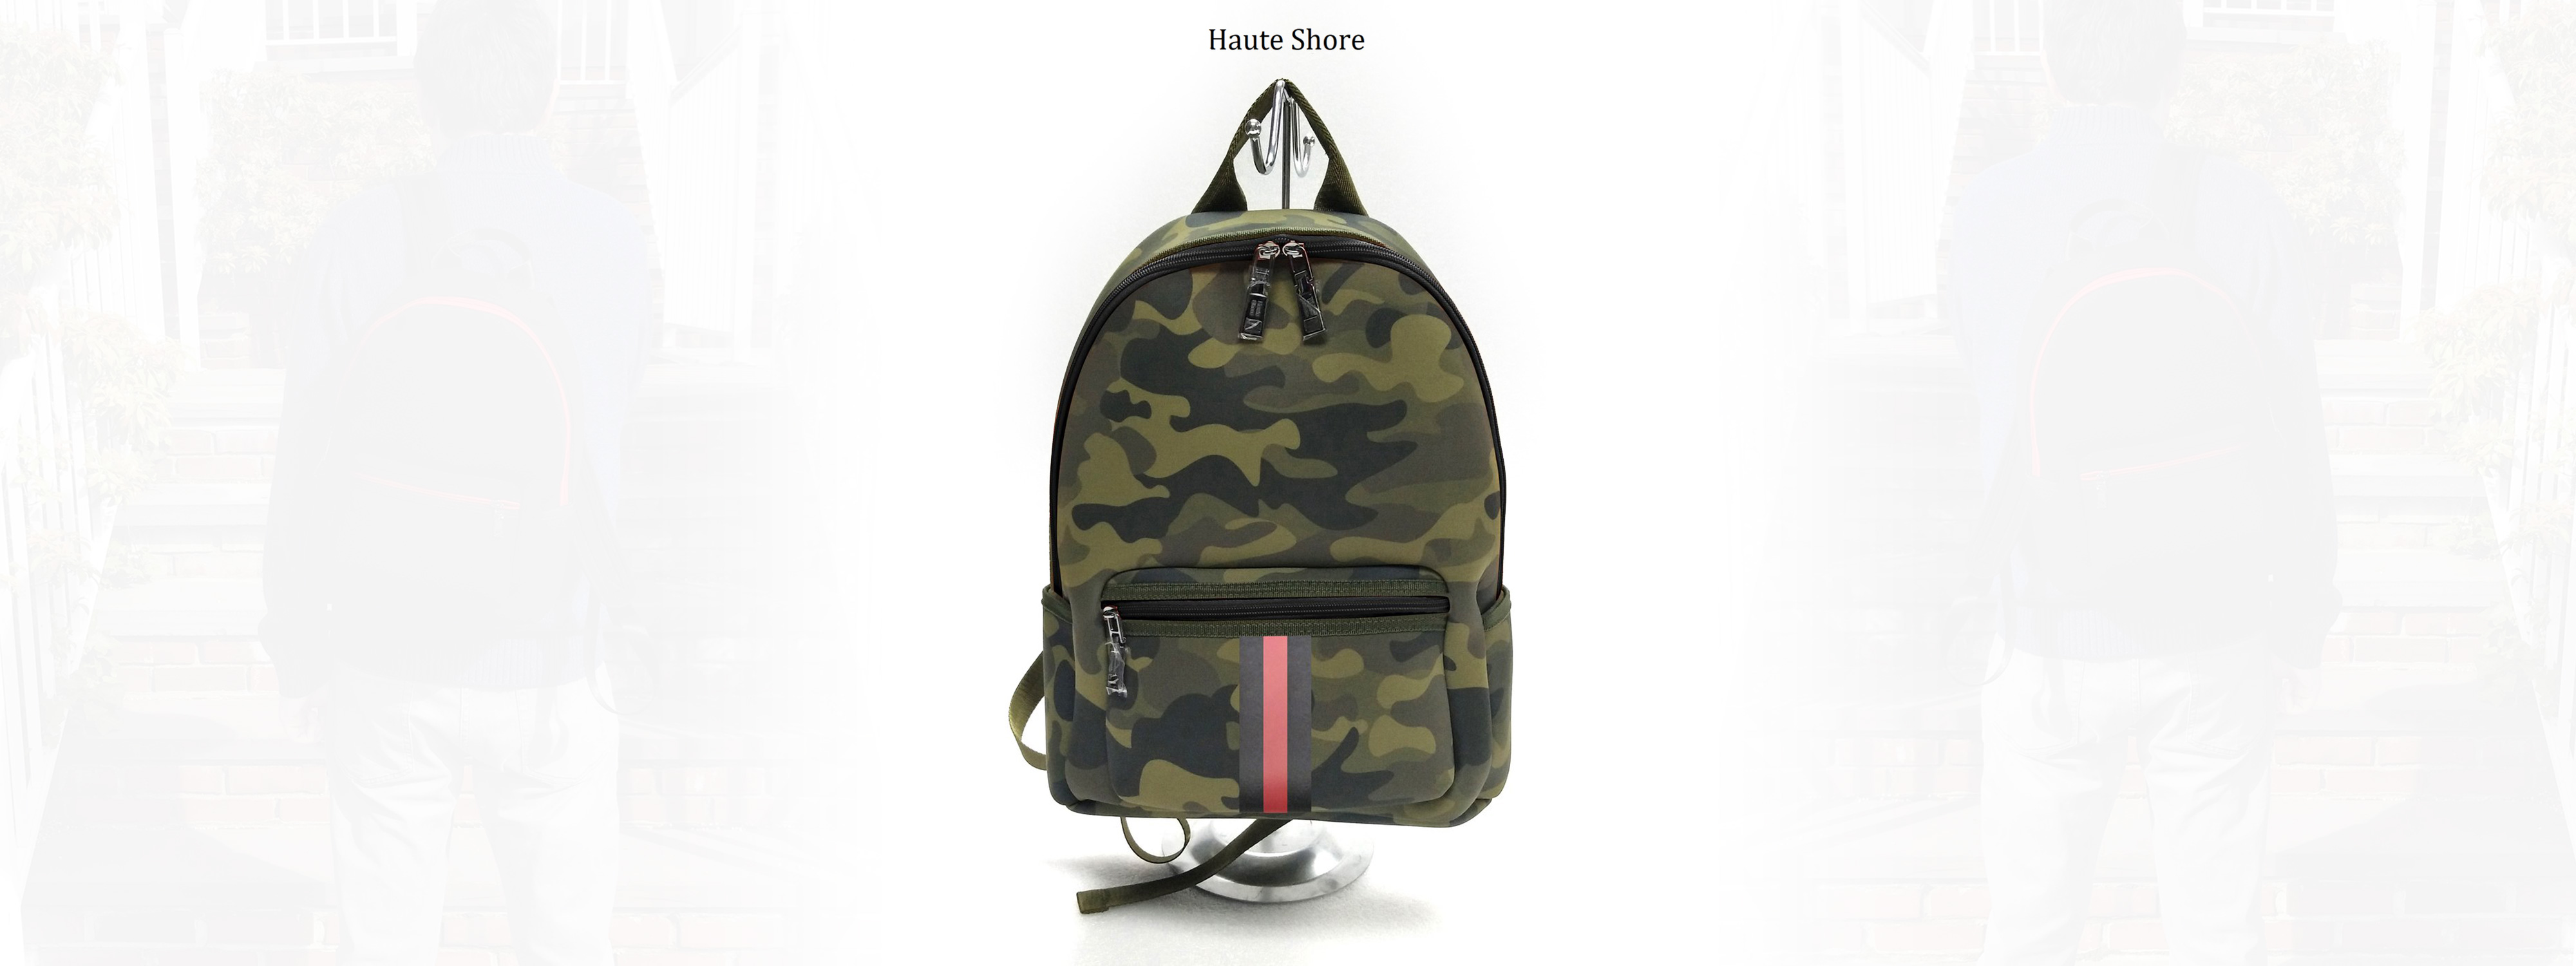 Haute-Shore-Alex_backpack